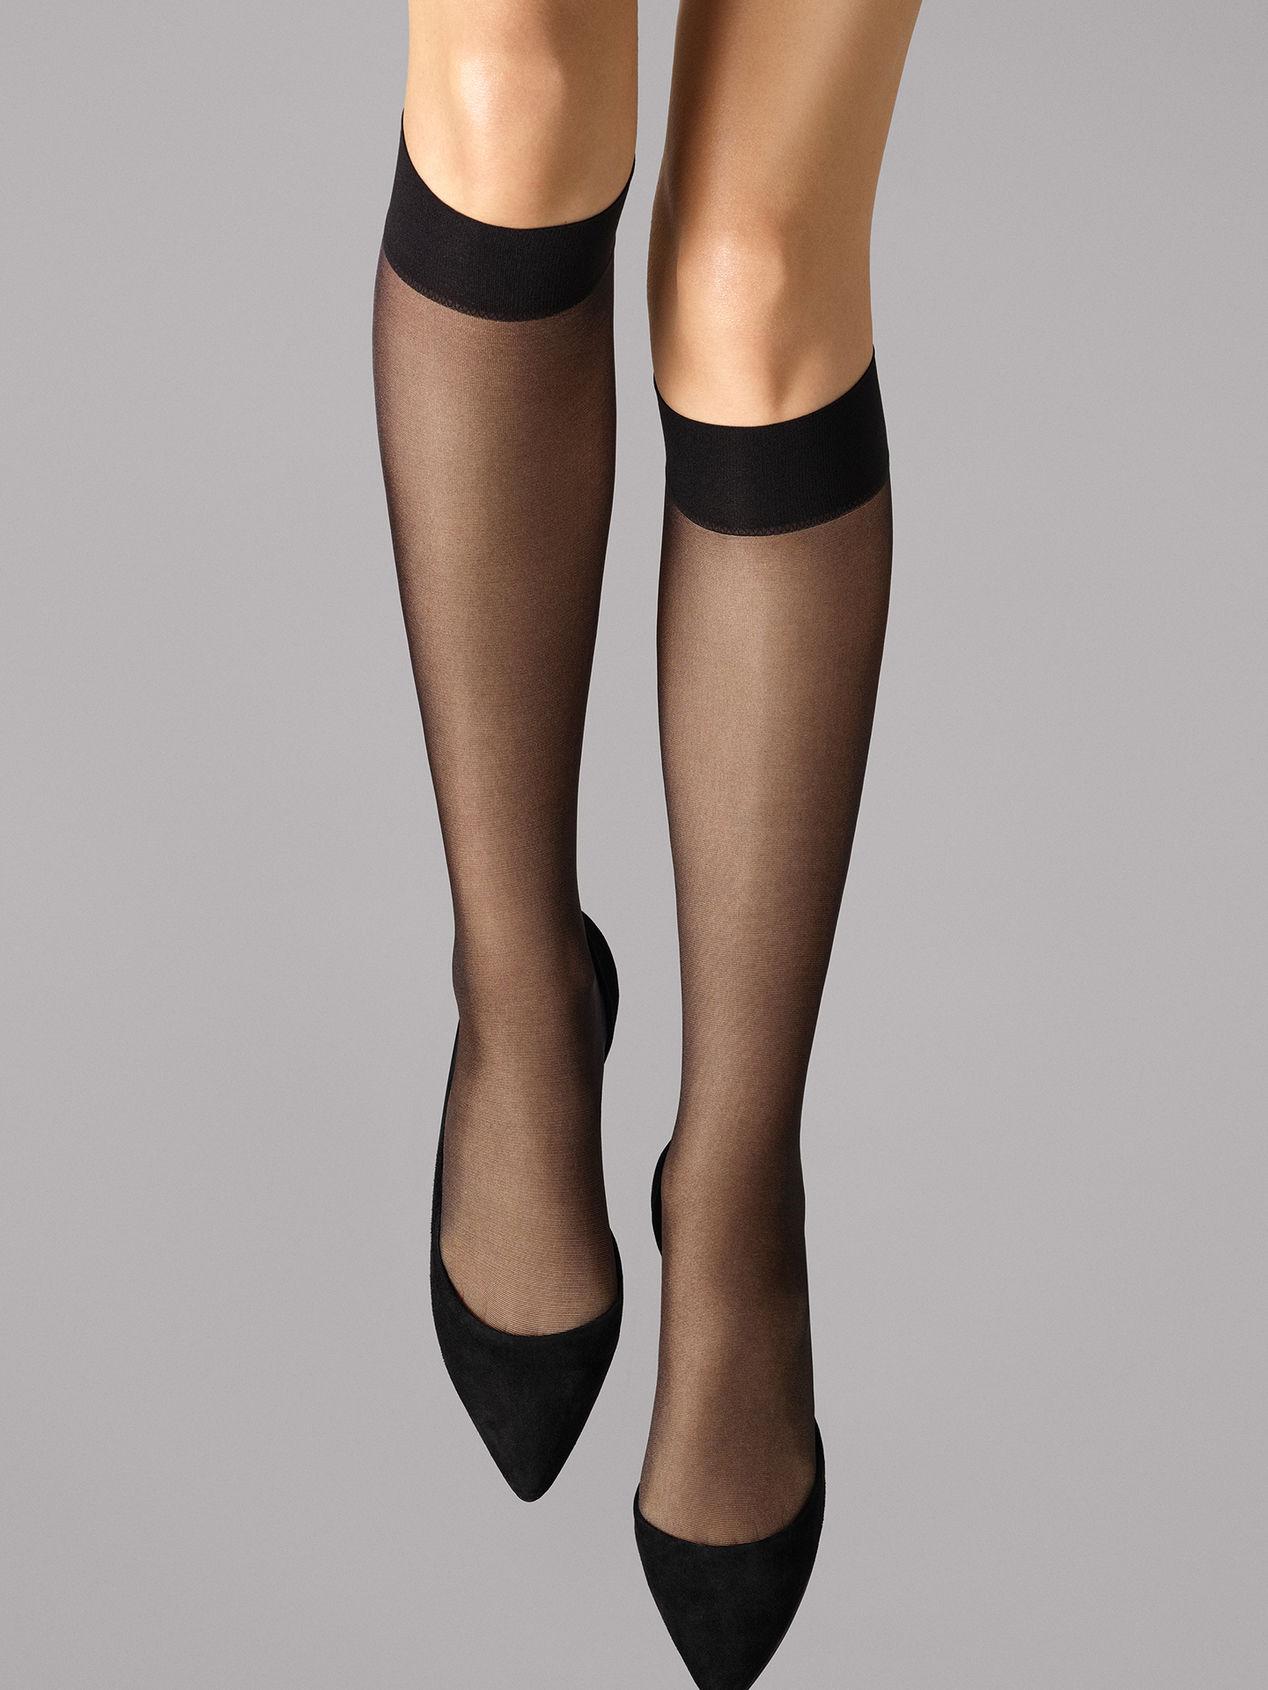 Wolford Satin Touch 20 Knee-Highs, black, medium